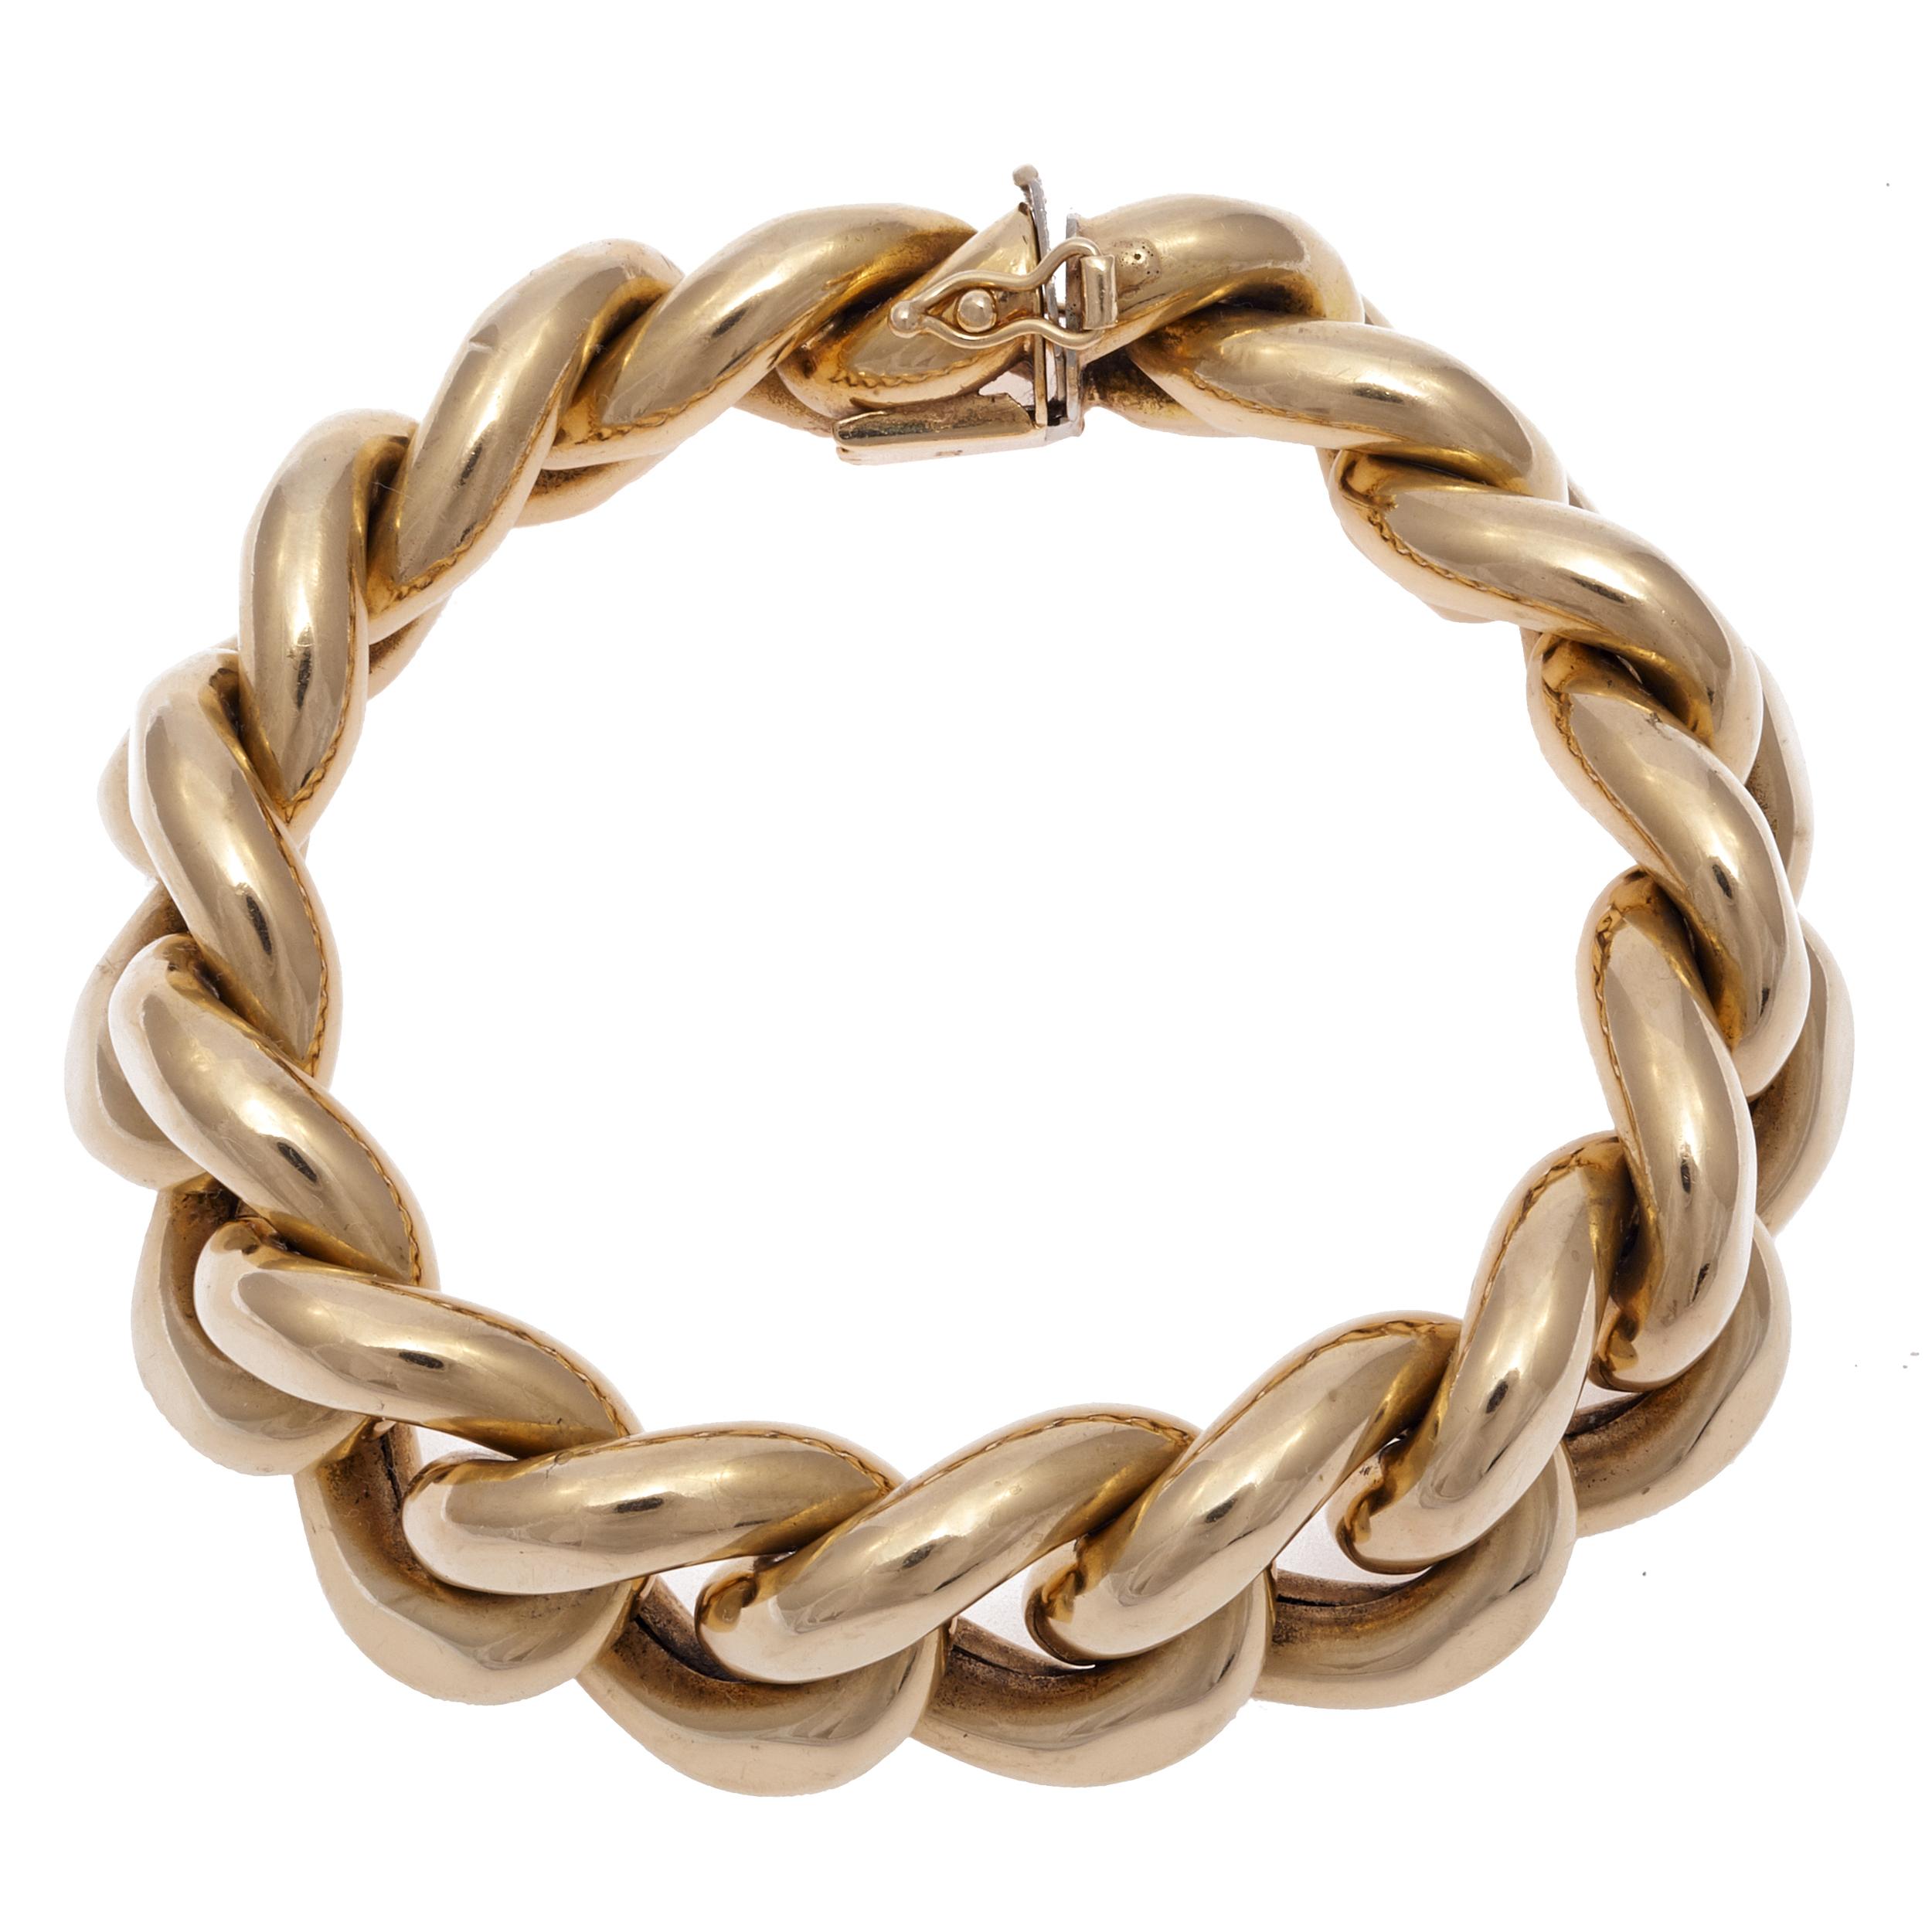 MARIETTE:chain bracelet,fine bracelet,drop bracelet,gold,filled gold,gold filled,gold-plated gold,druaughty fine stones,tourmalines